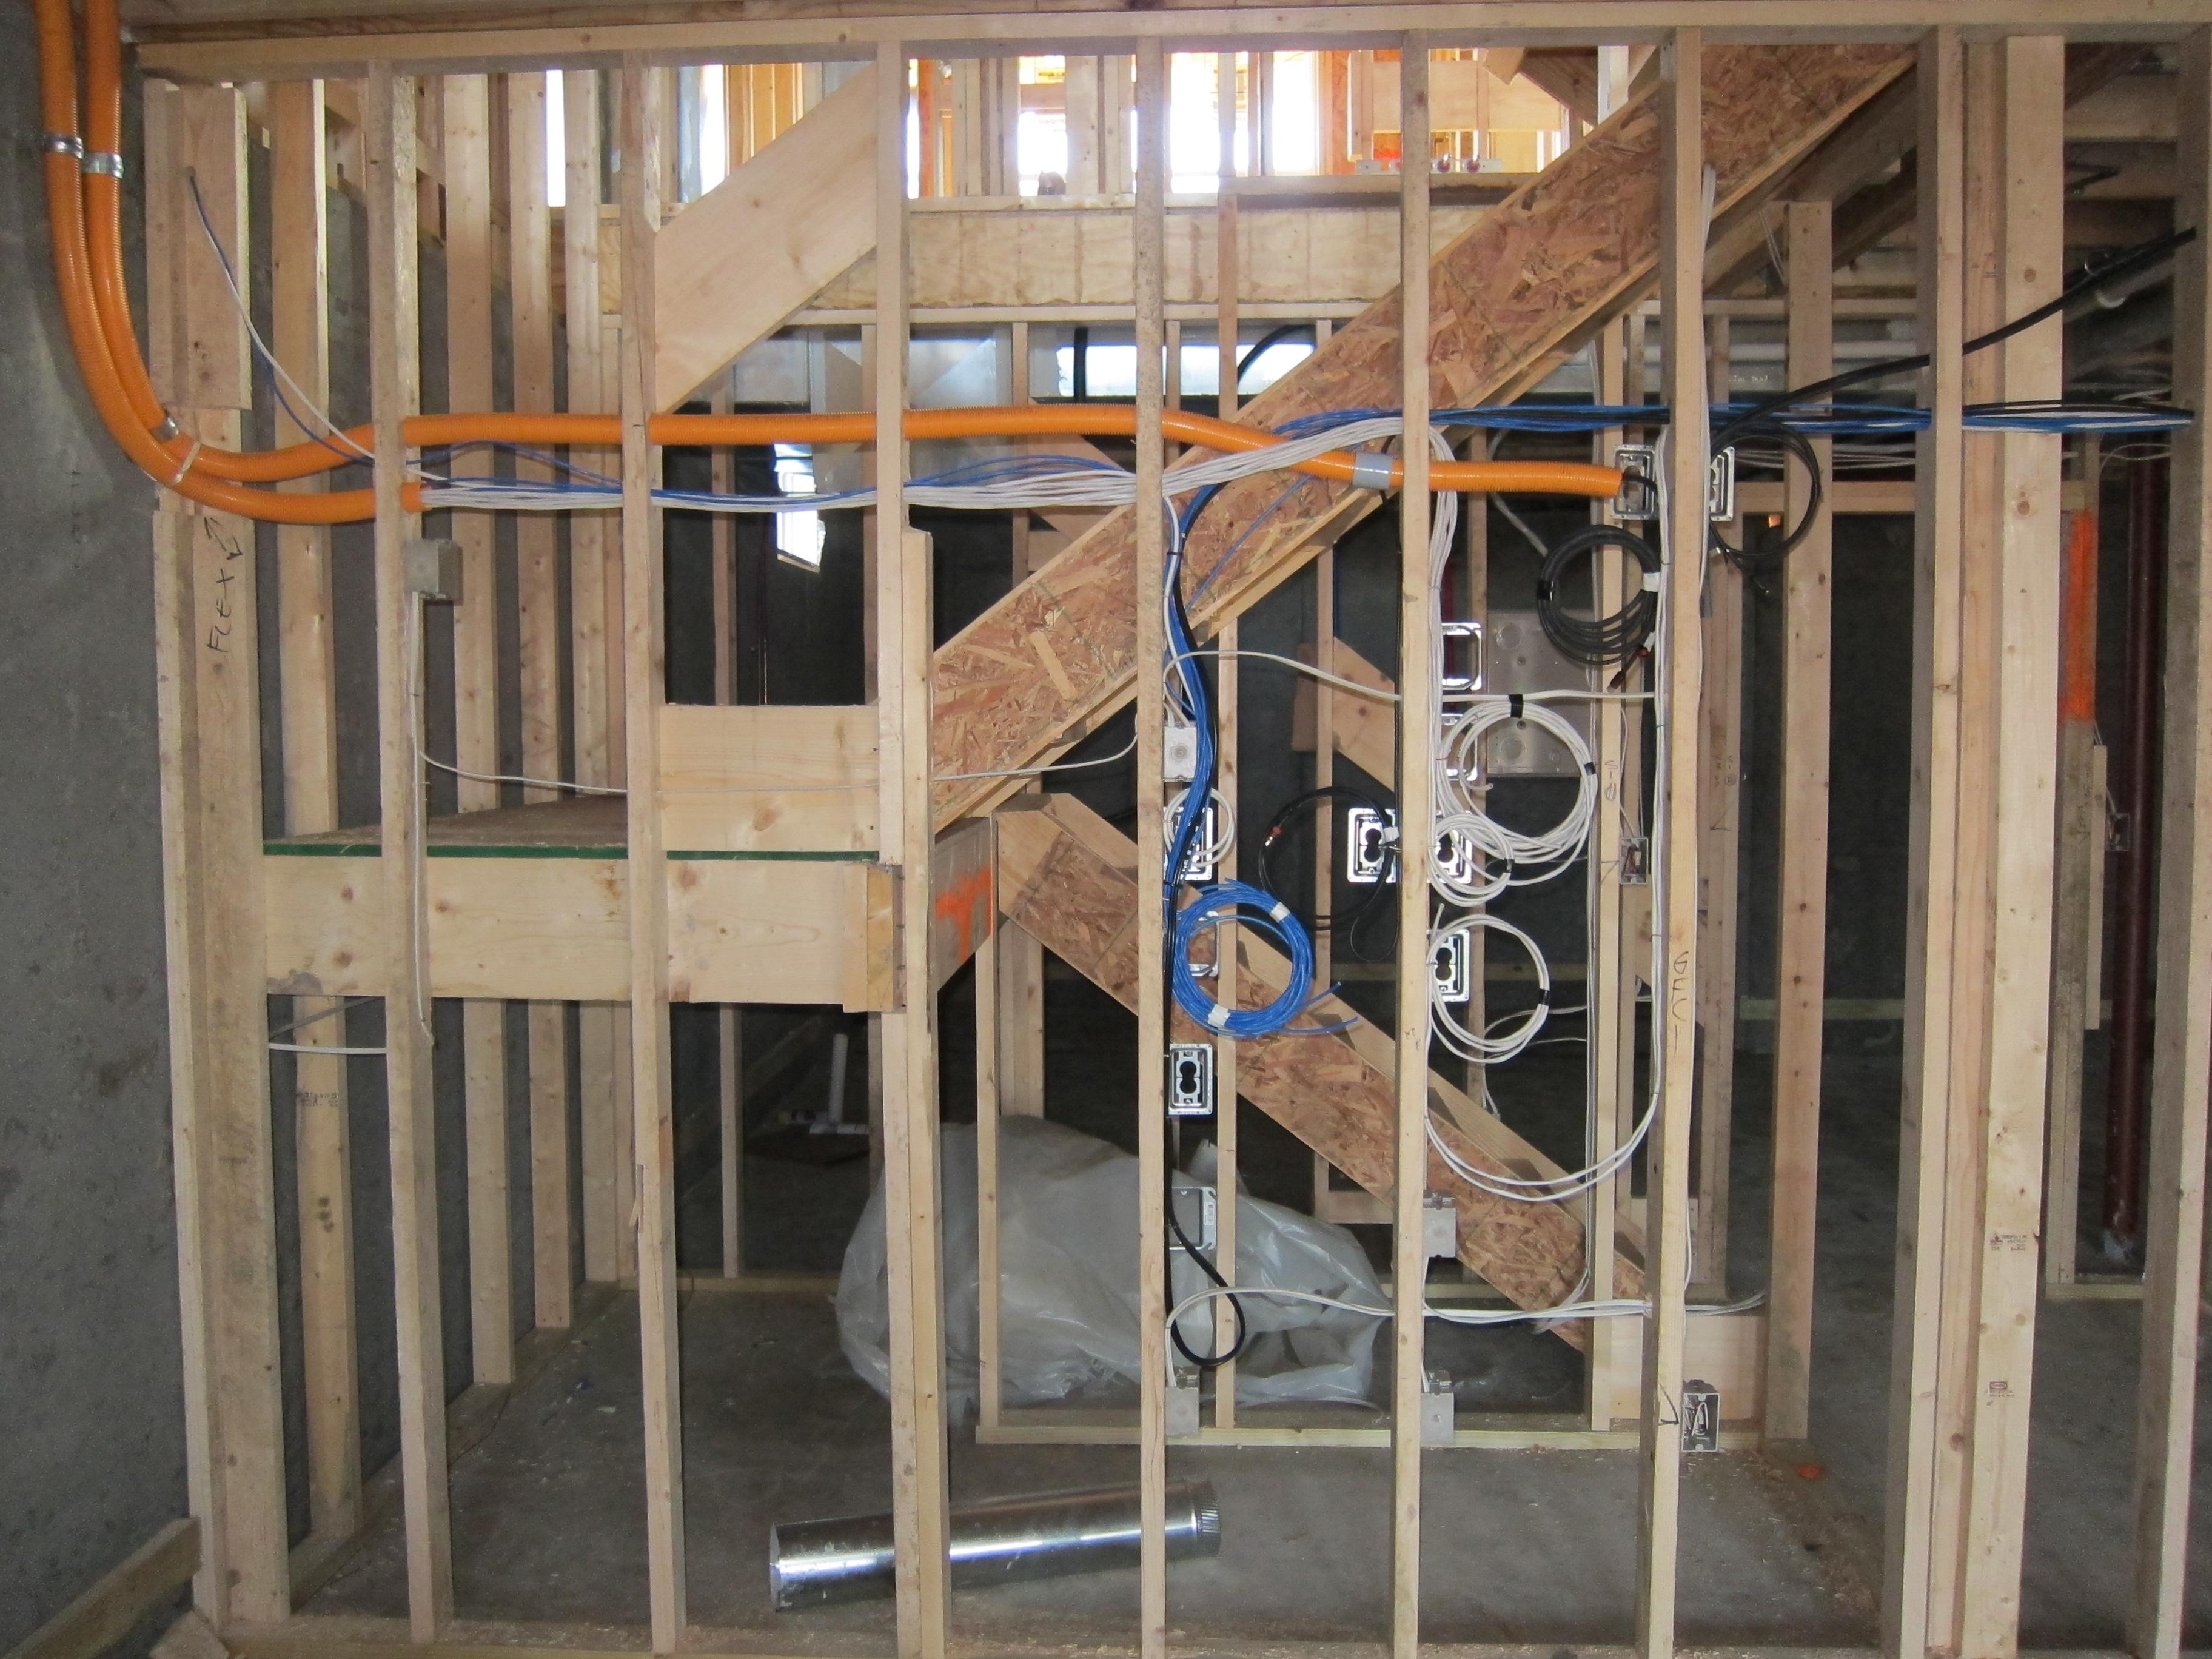 basement wiring lethbridge lethbridge electric ltd rh lethbridgeelectric ca Wiring a New Room Wiring Basement Outlets